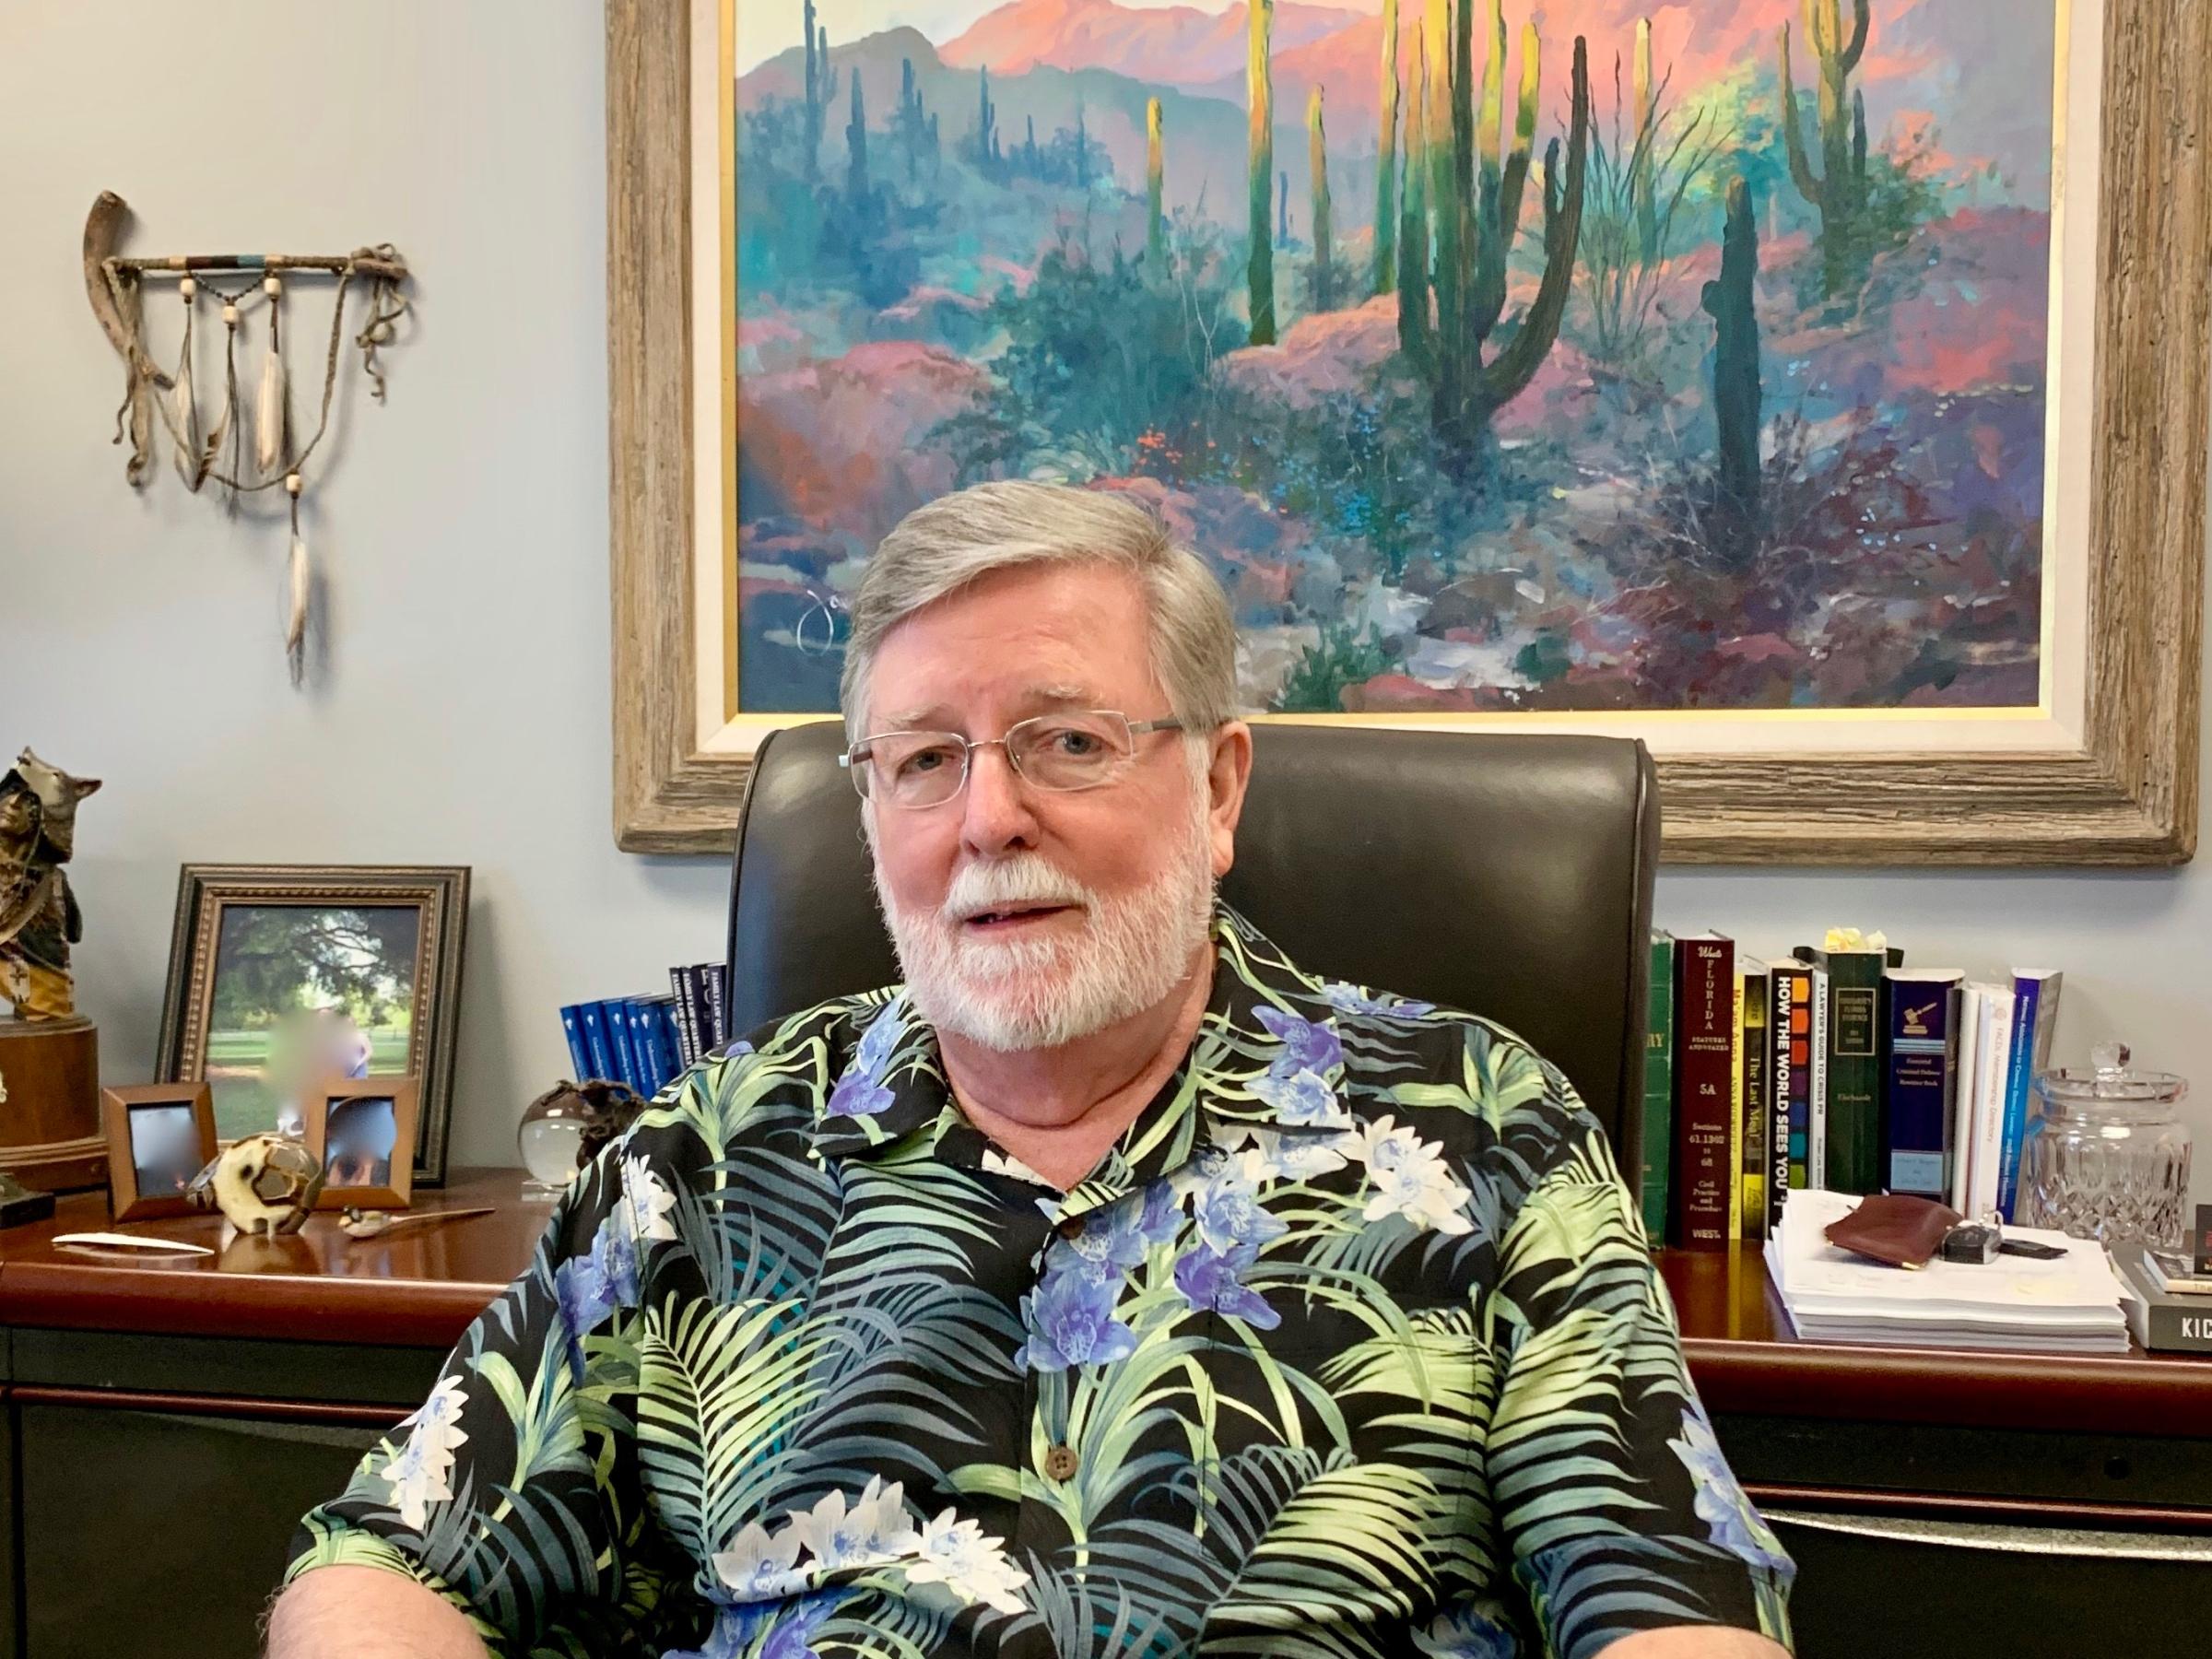 J. Cheney Mason